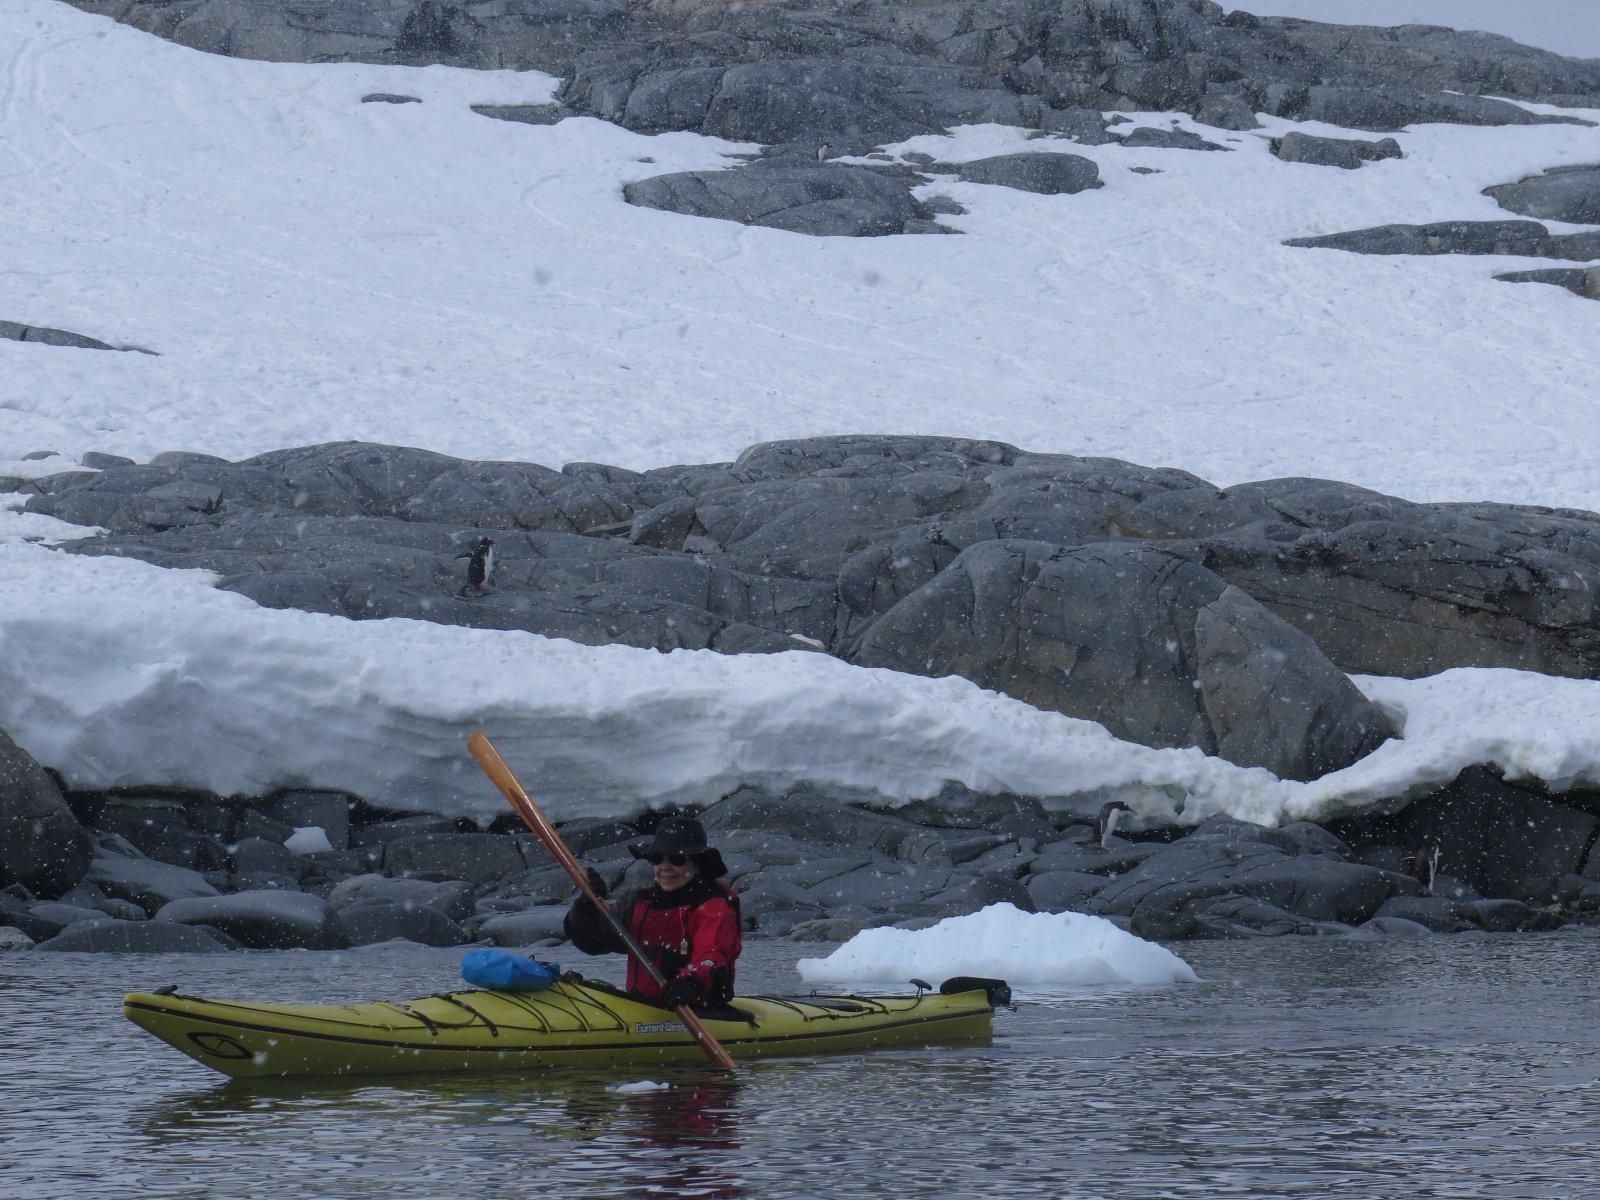 Click image for larger version  Name:Snowing & Gentoo Penguins.jpg Views:156 Size:358.7 KB ID:231277